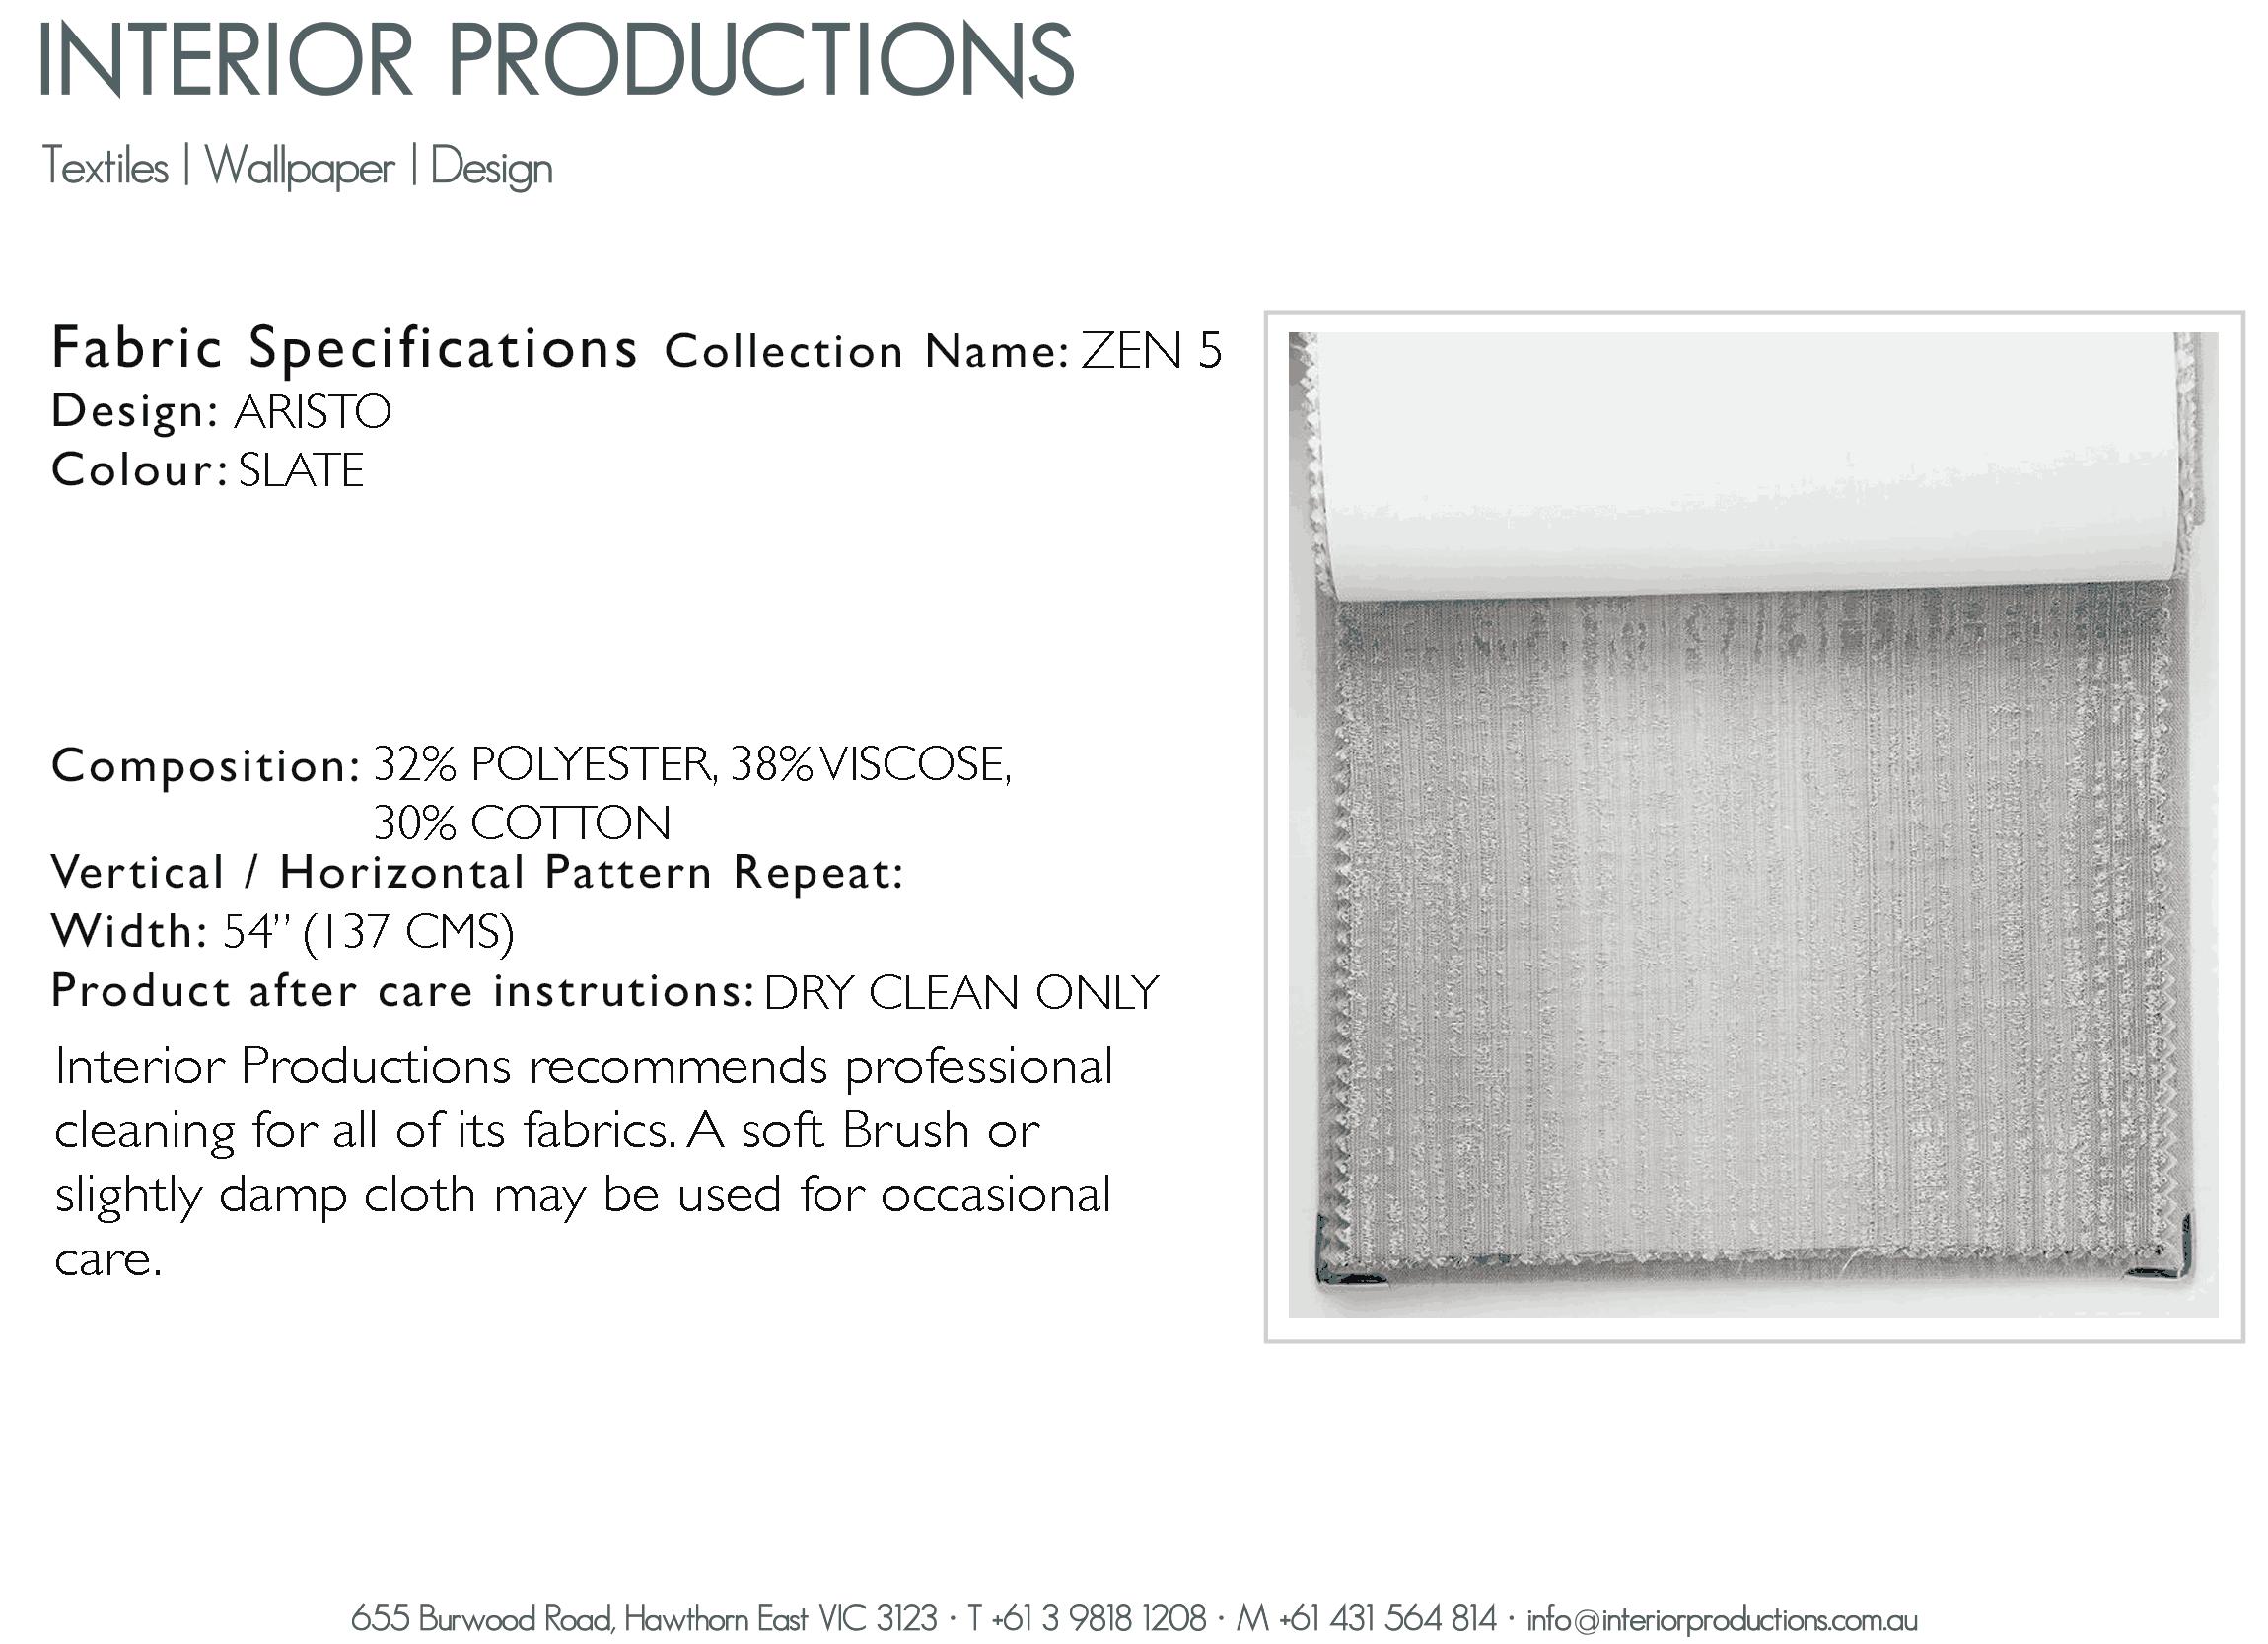 interior_productions_ARISTO---SLATE